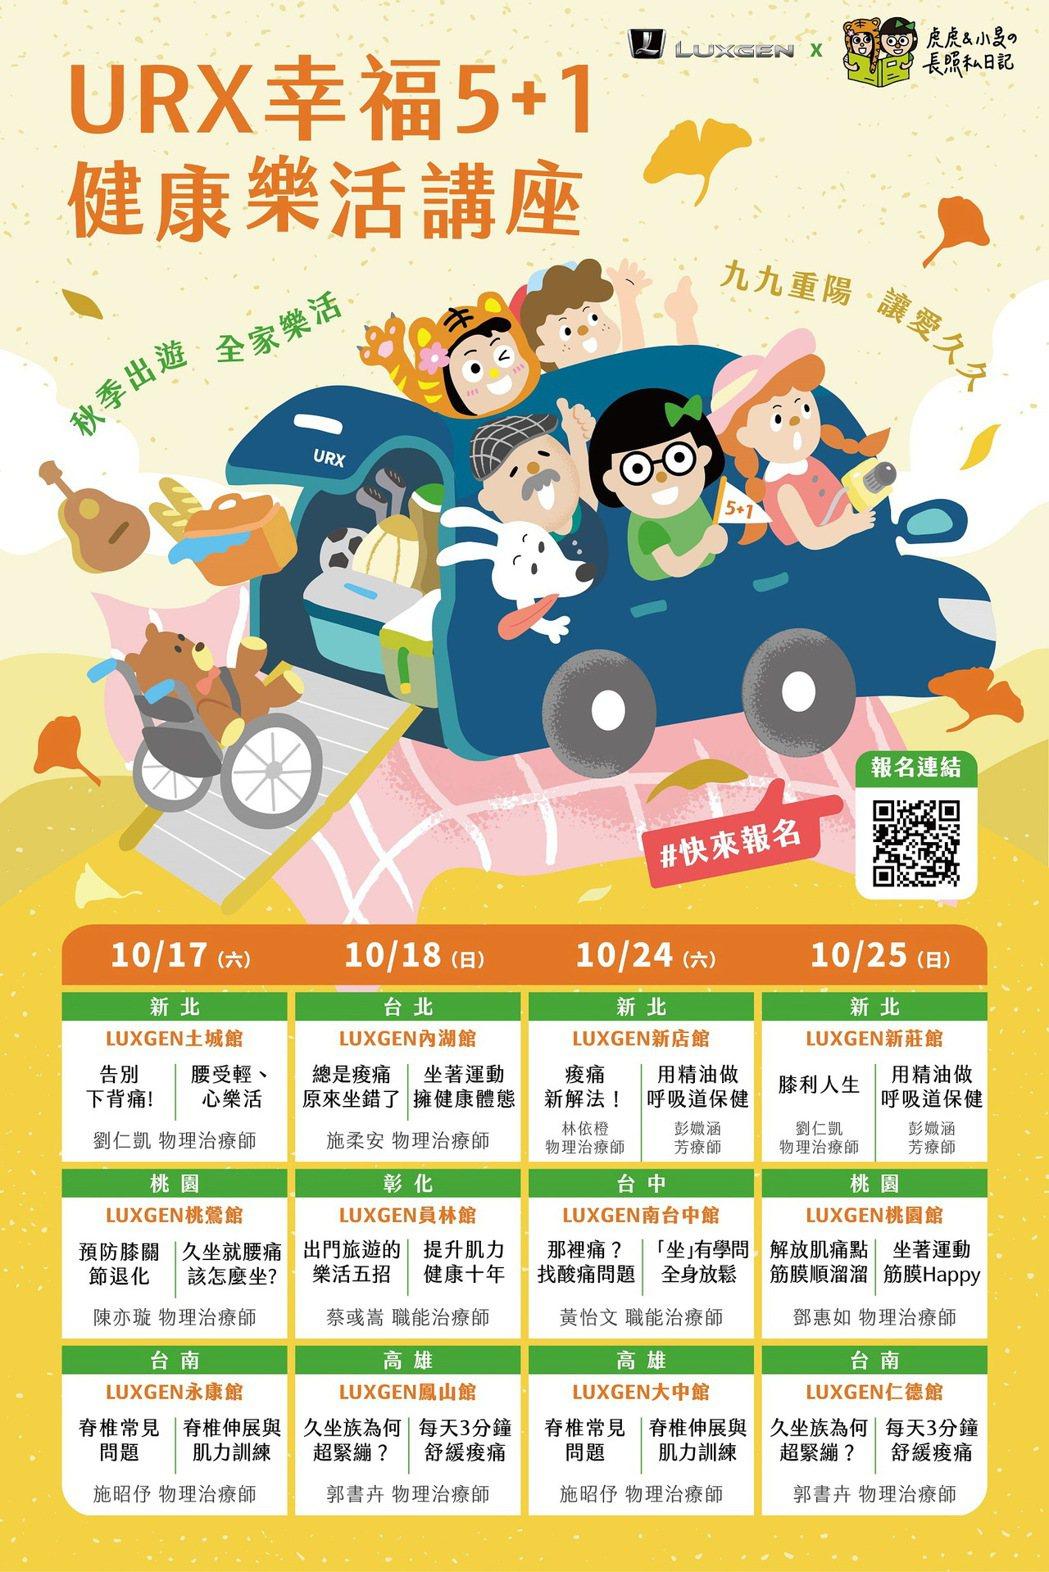 LUXGEN自10/17(六)起免費舉辦全台共12場《URX幸福5+1健康樂活講...